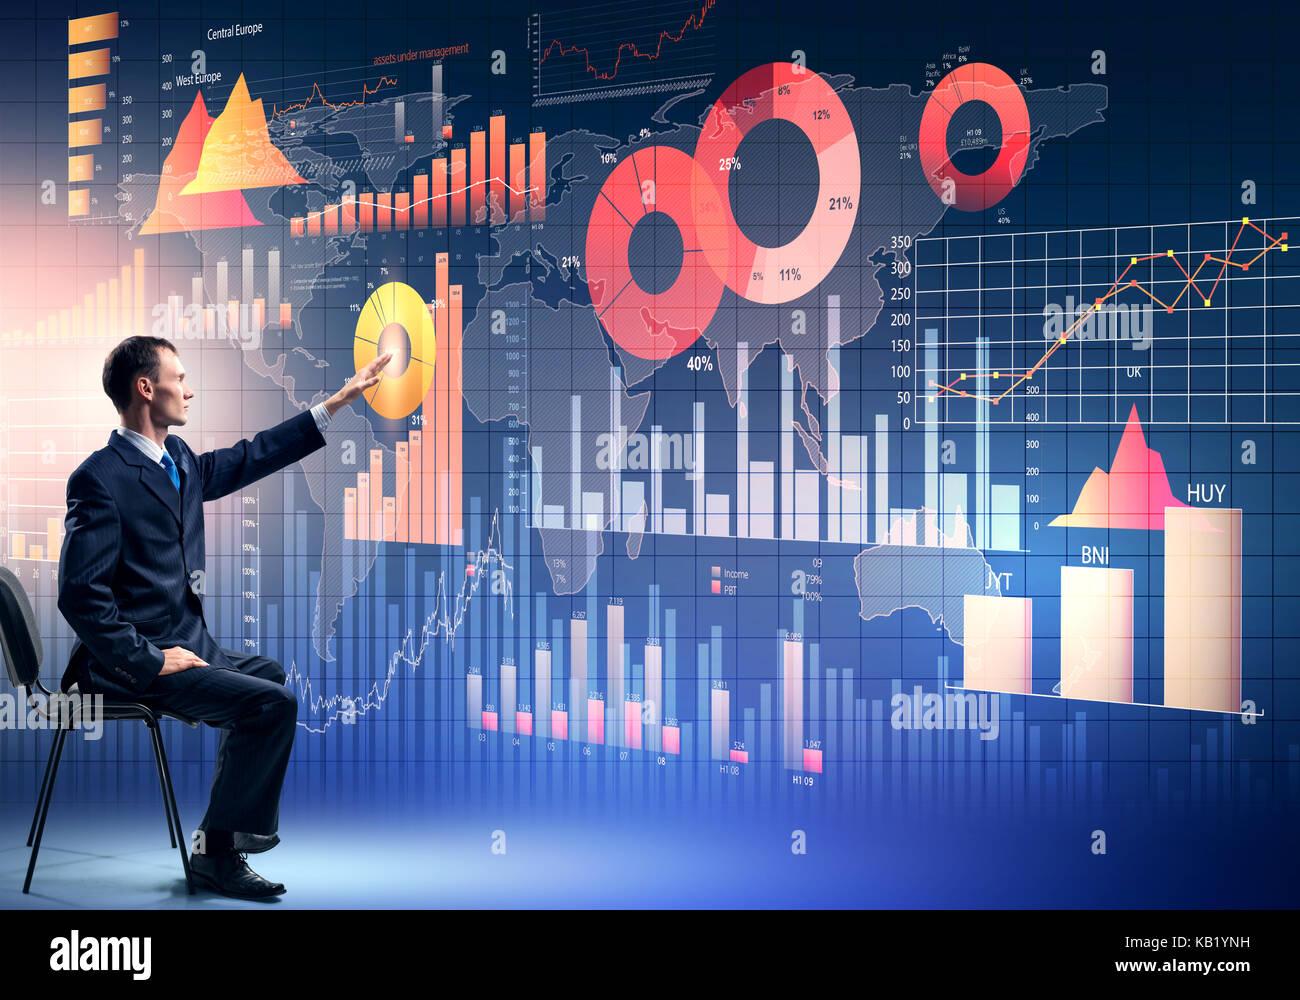 Businessman using media interface Stock Photo